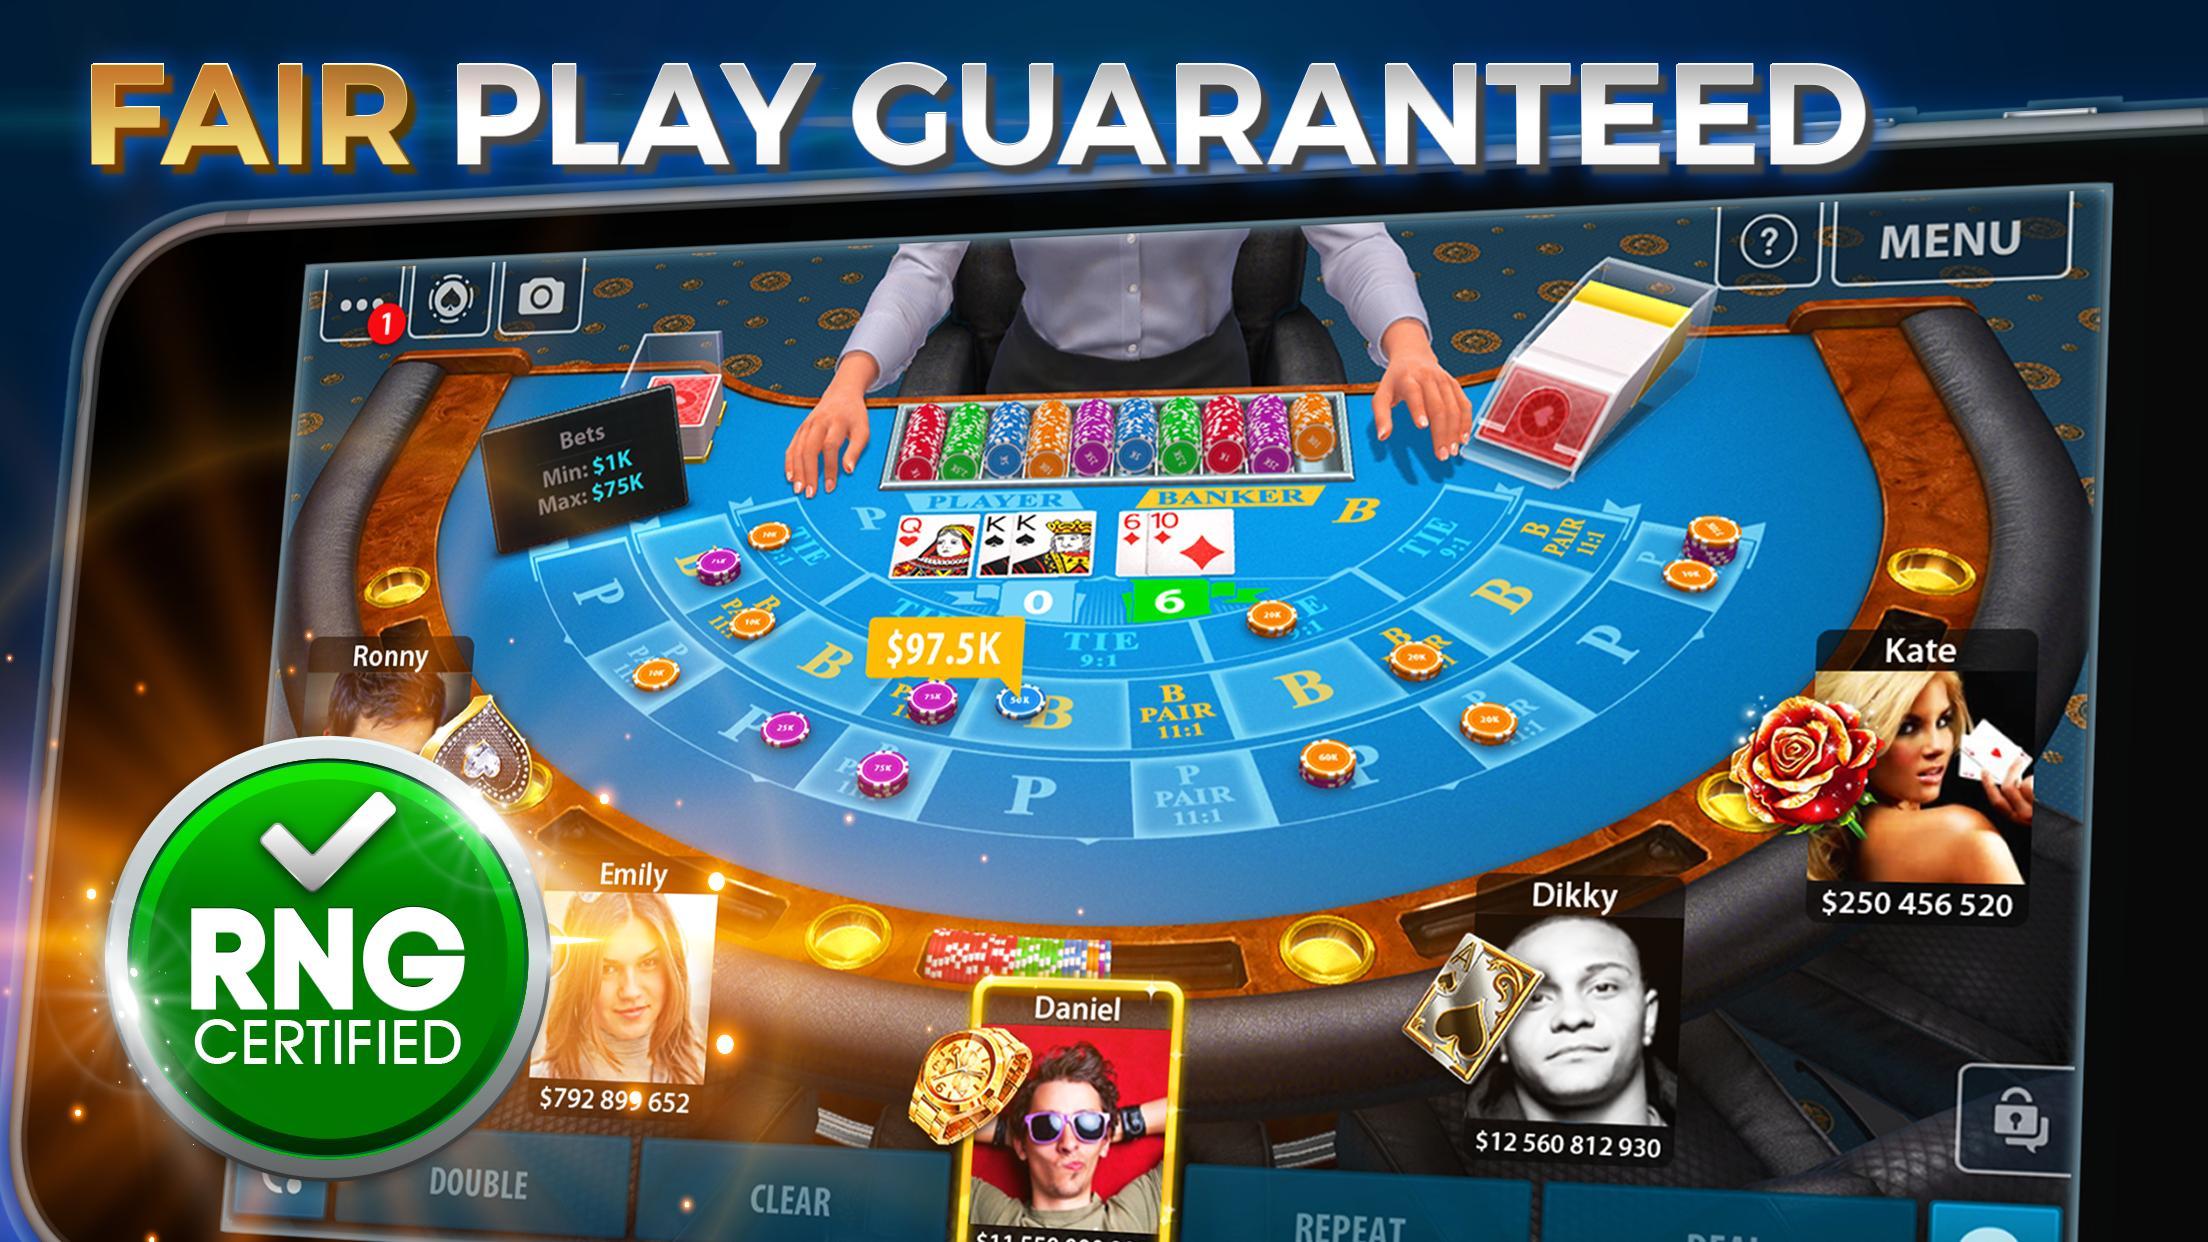 Las Vegas Casinos - Bellagio